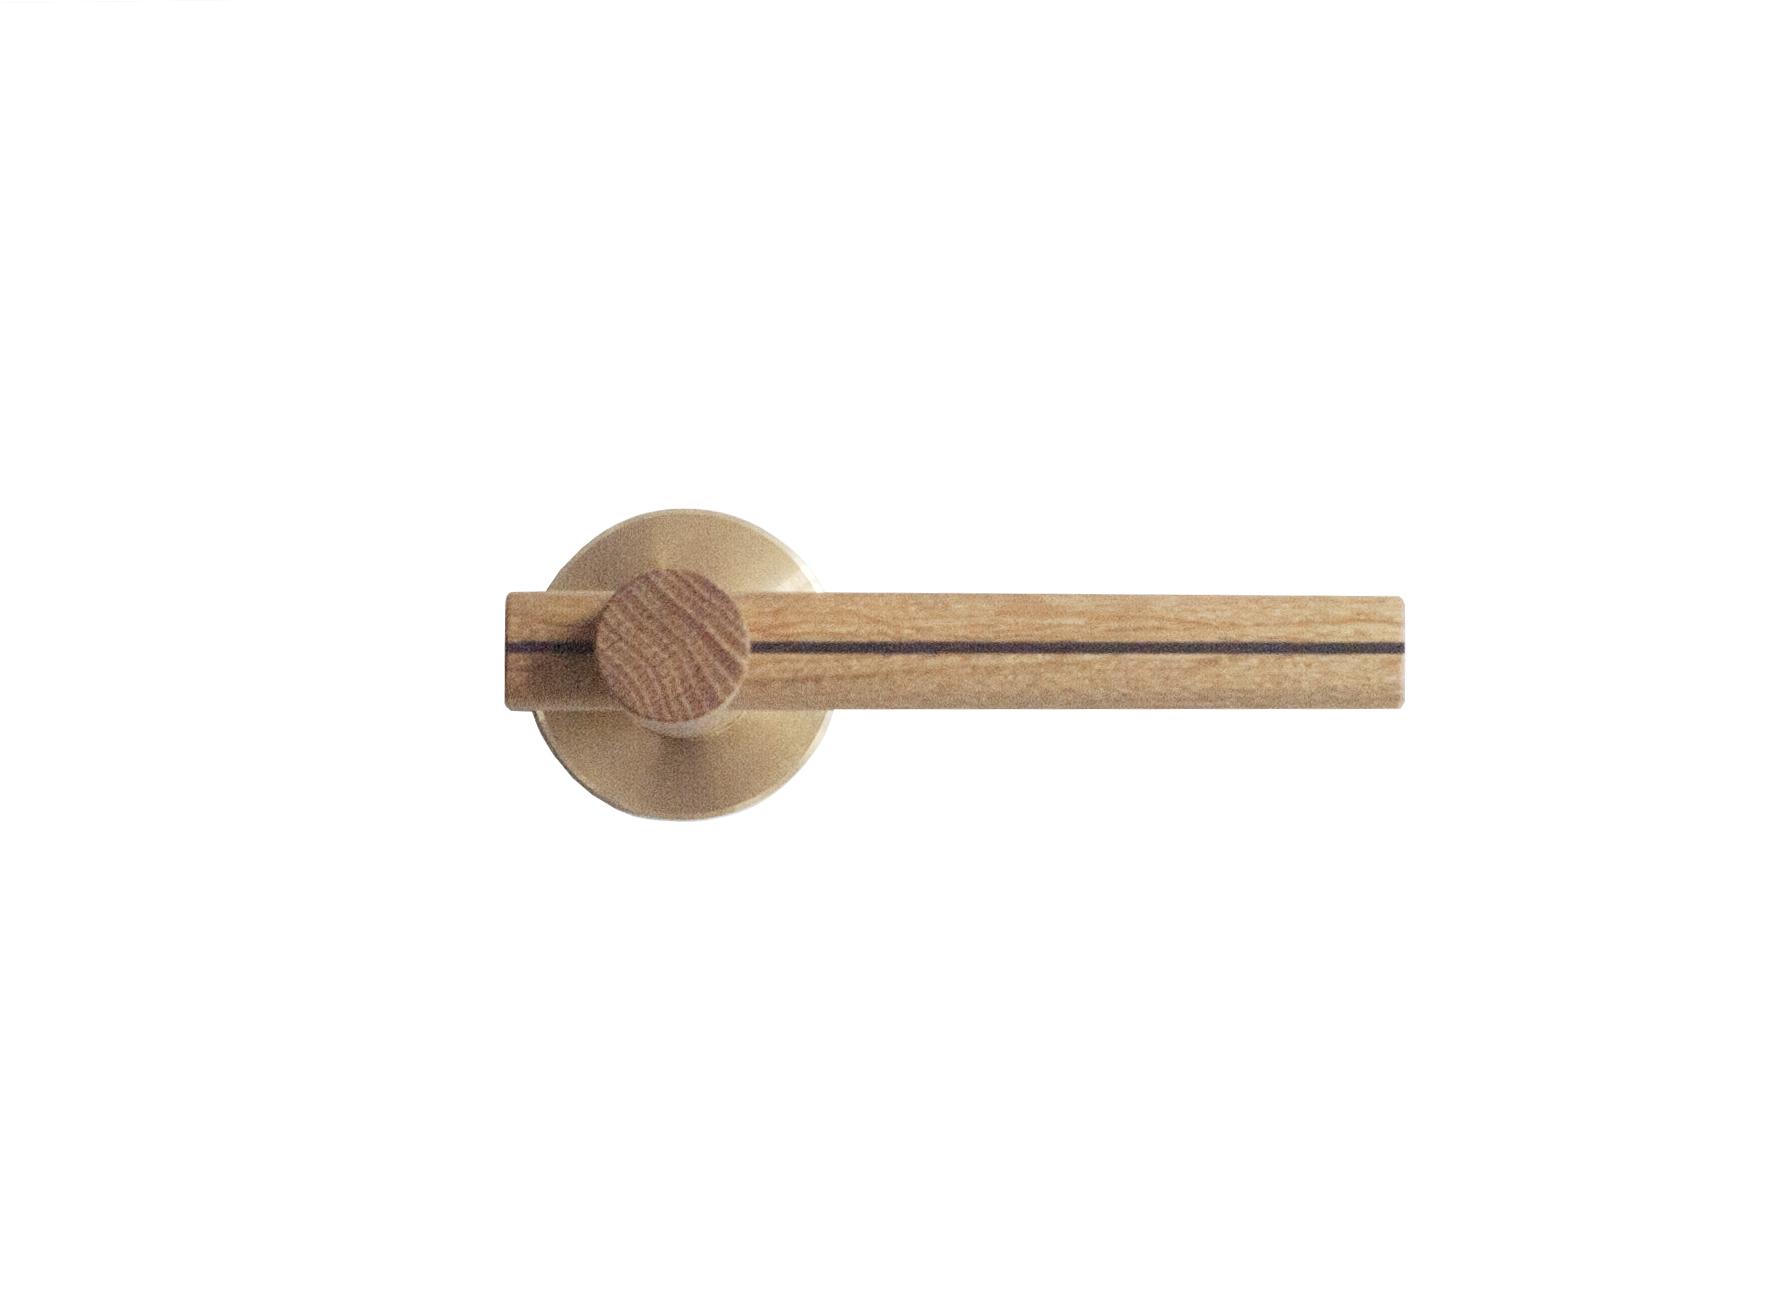 Door handle in oak and fumed oak treated with linseed oil.